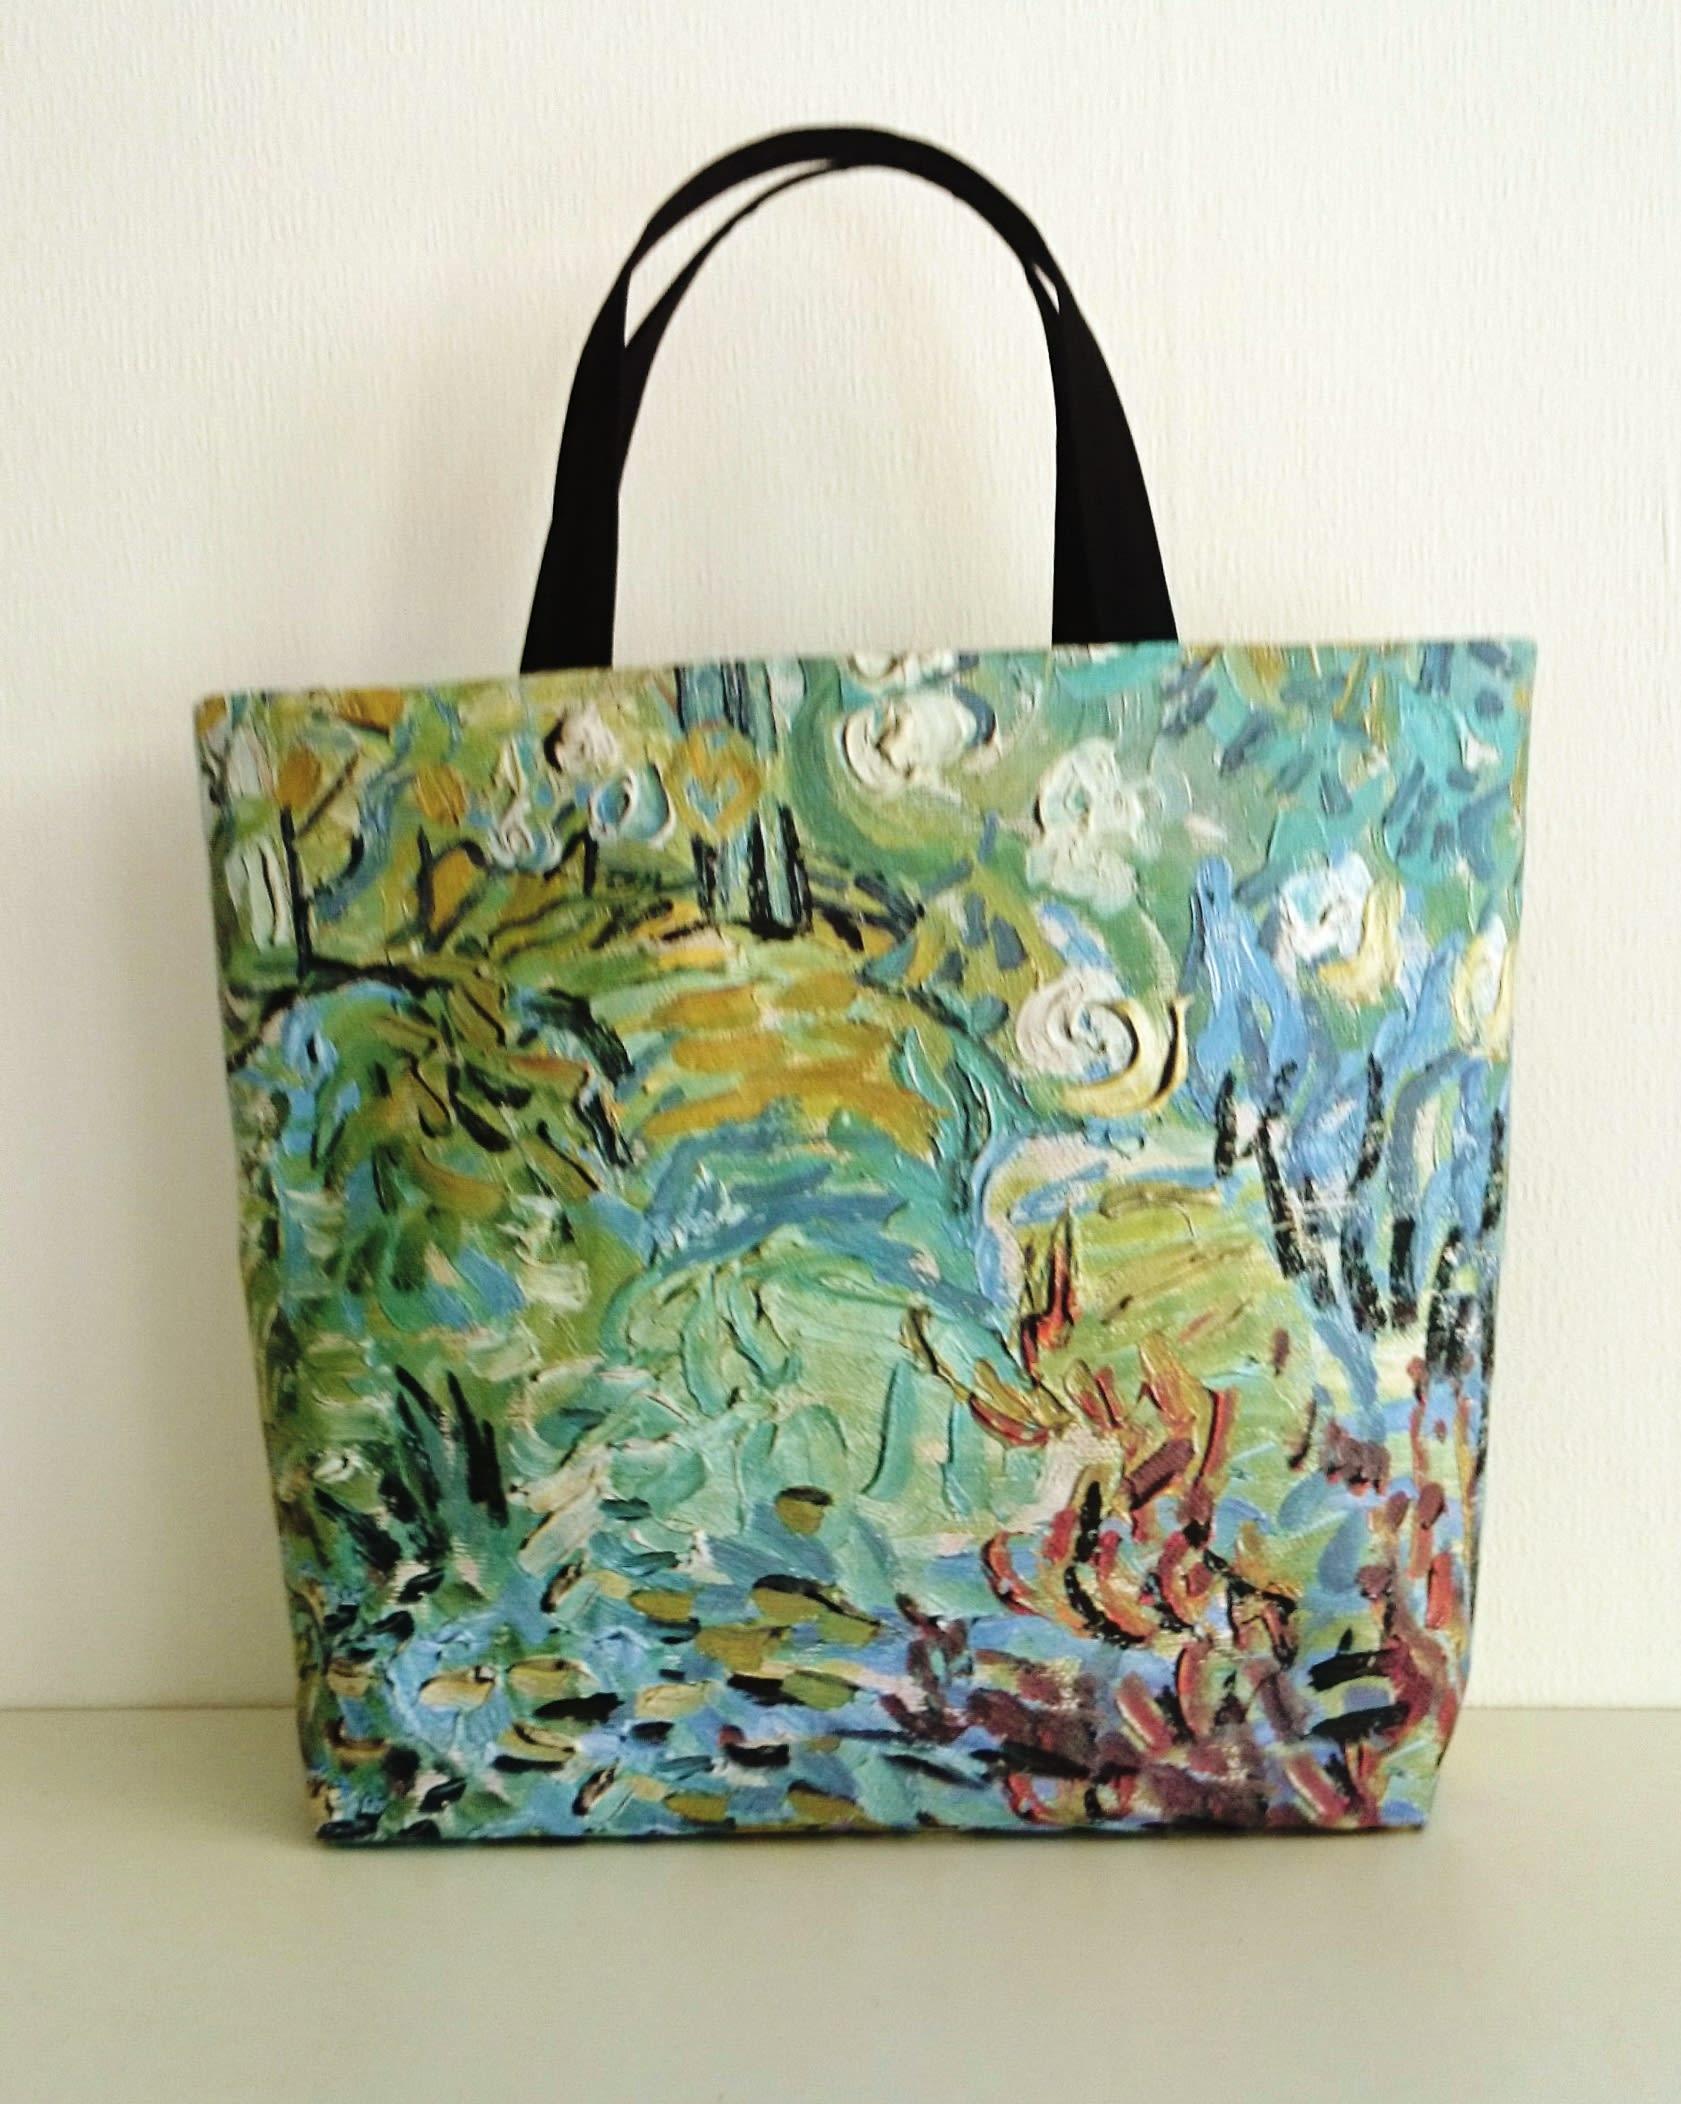 Sac cabas vert et bleu, tableau de Van Gogh.